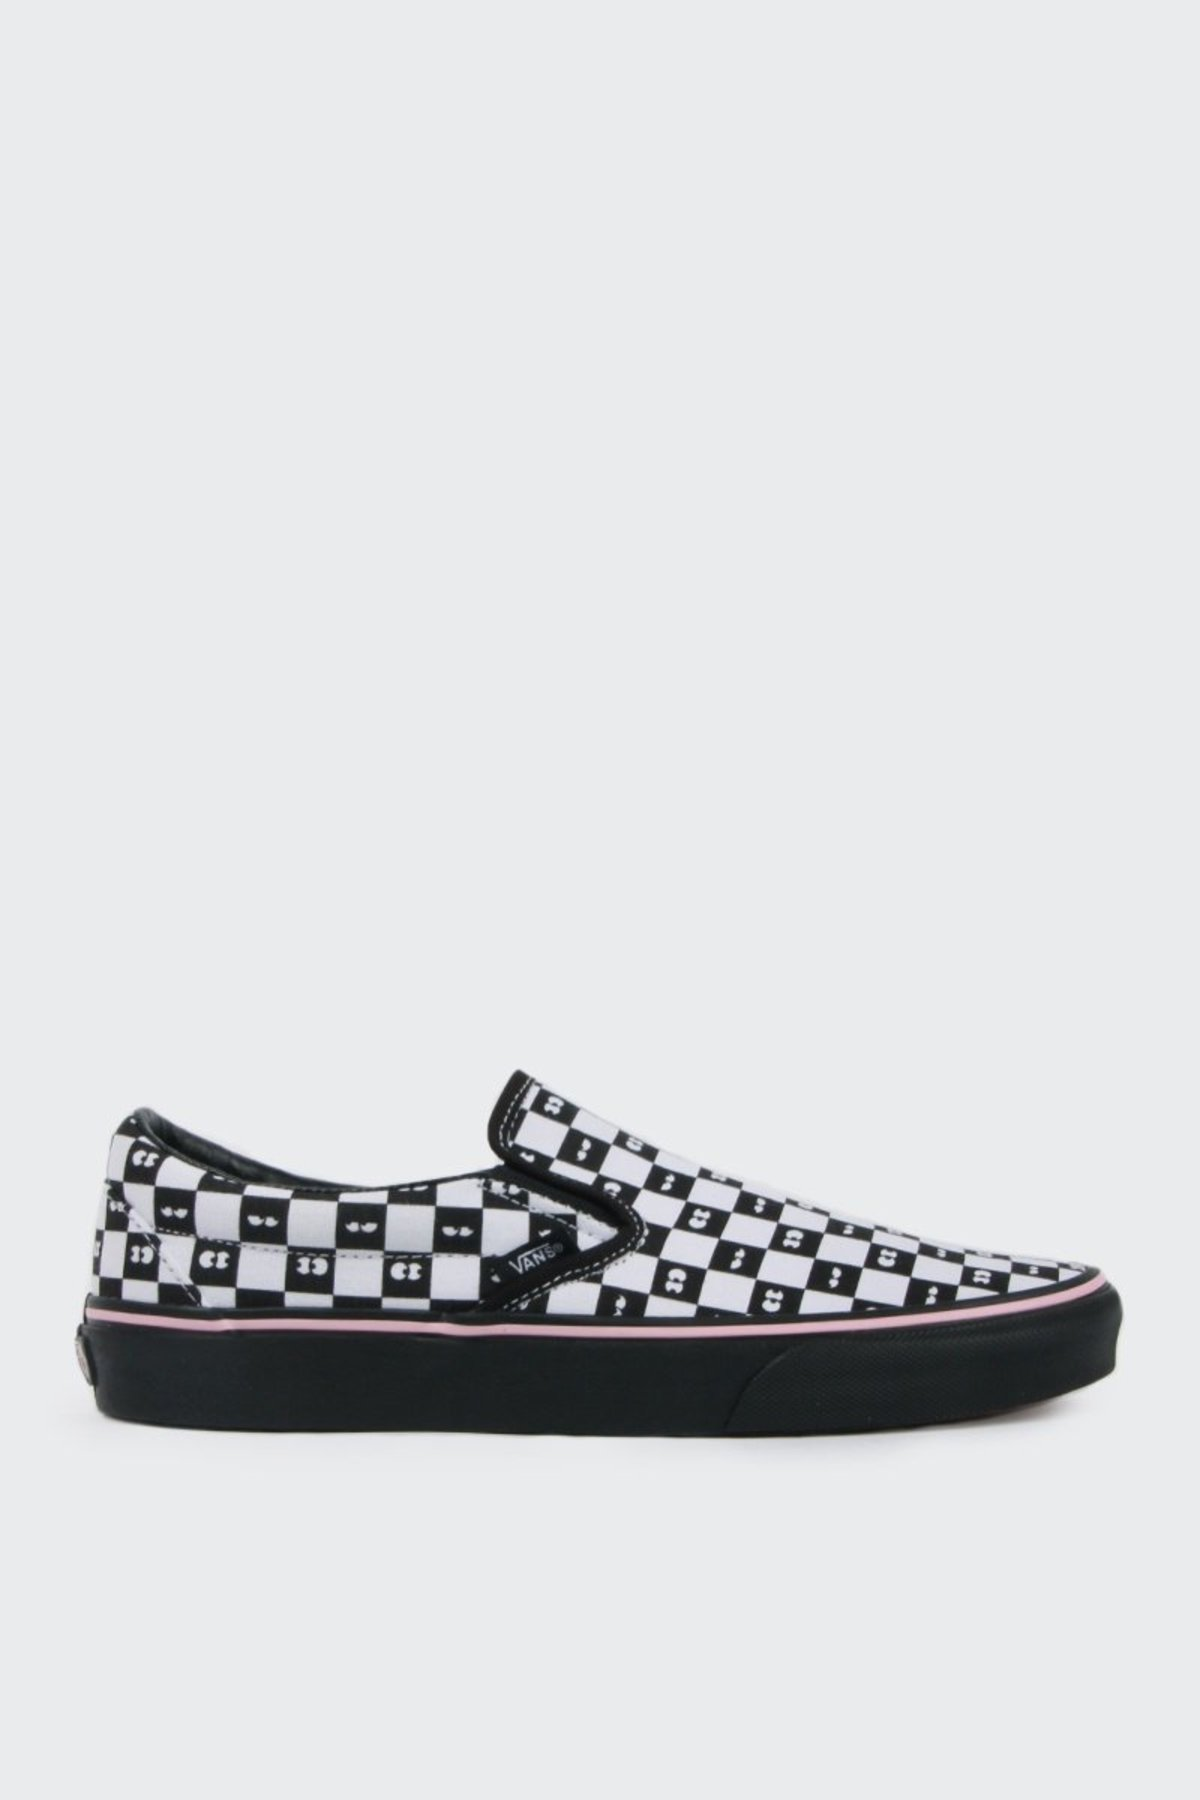 VANS X Lazy Oaf Classic Slip On checkerboardeyeballs